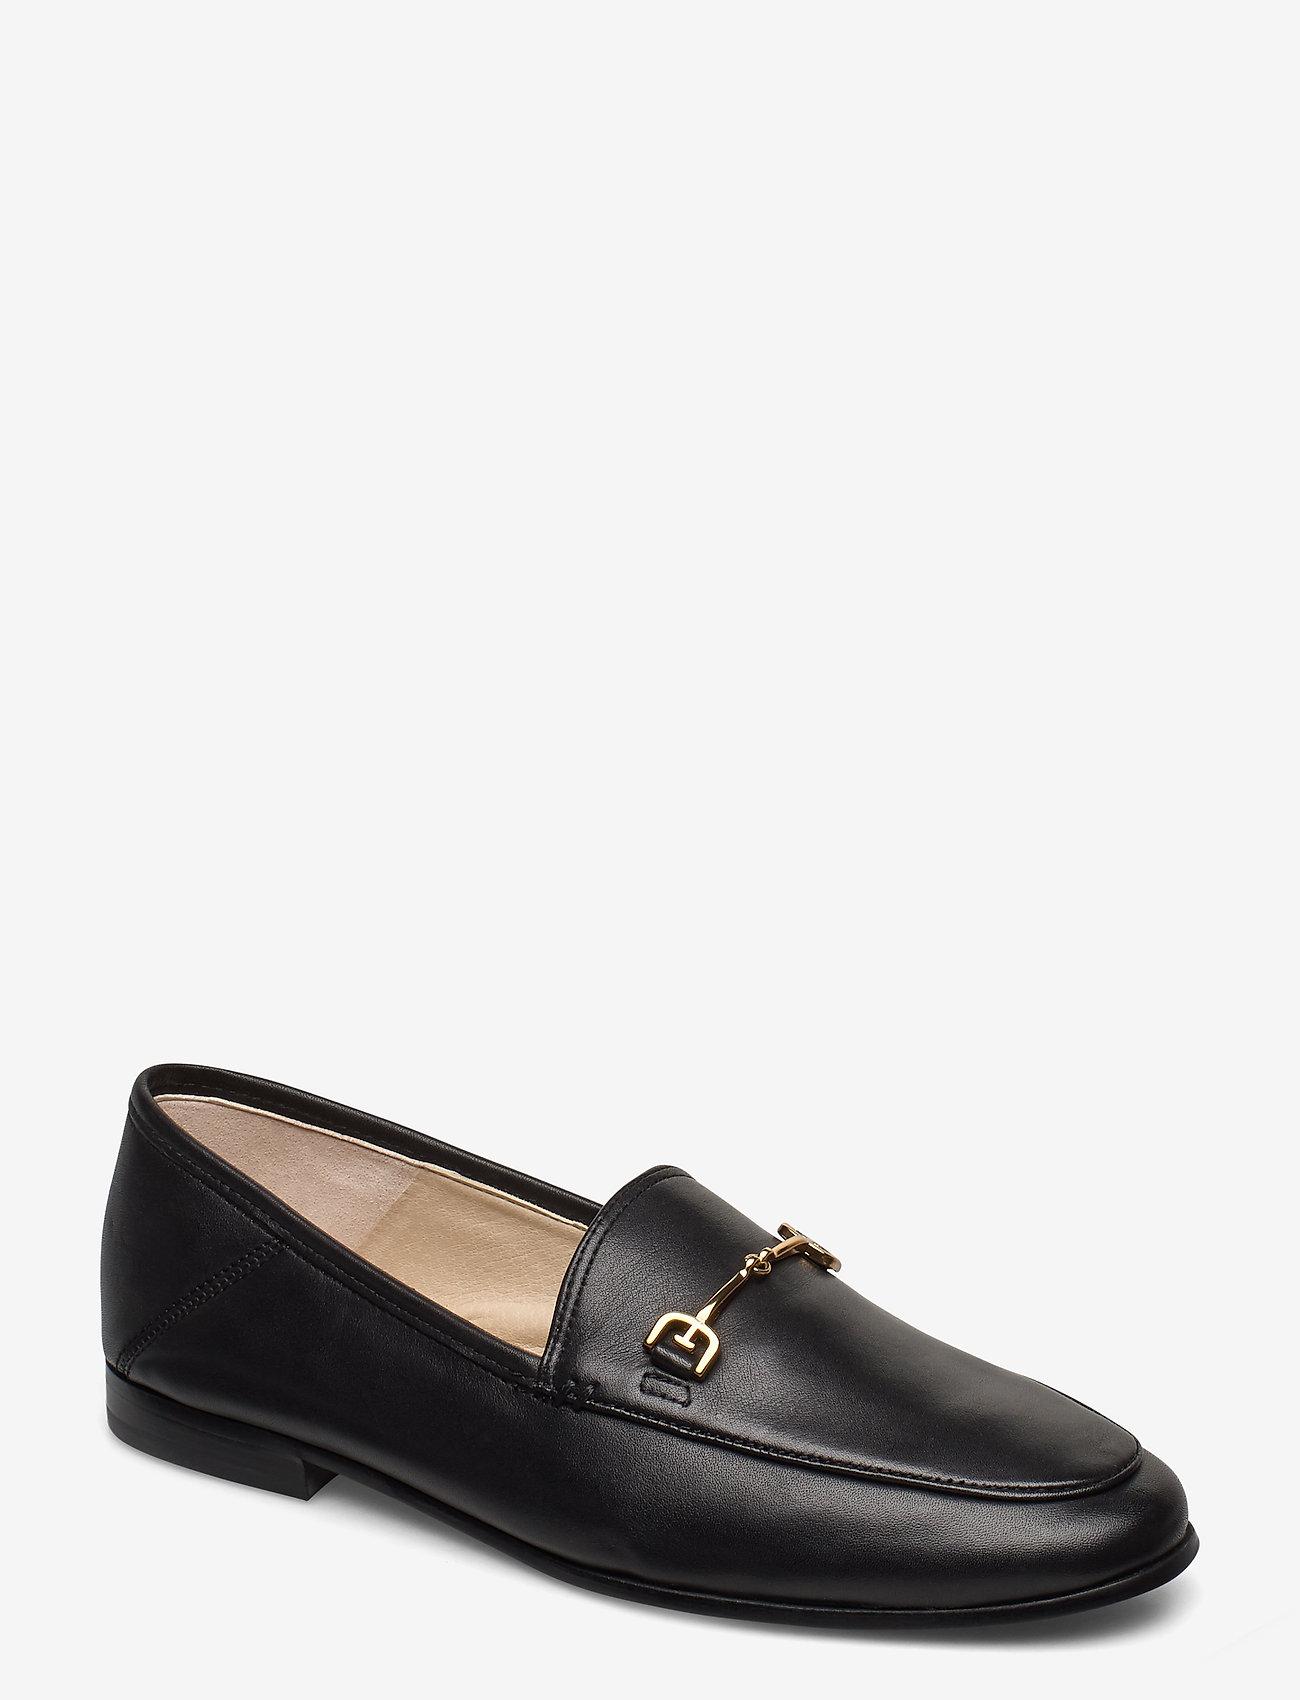 Sam Edelman - LORAINE - loafers - black - 0